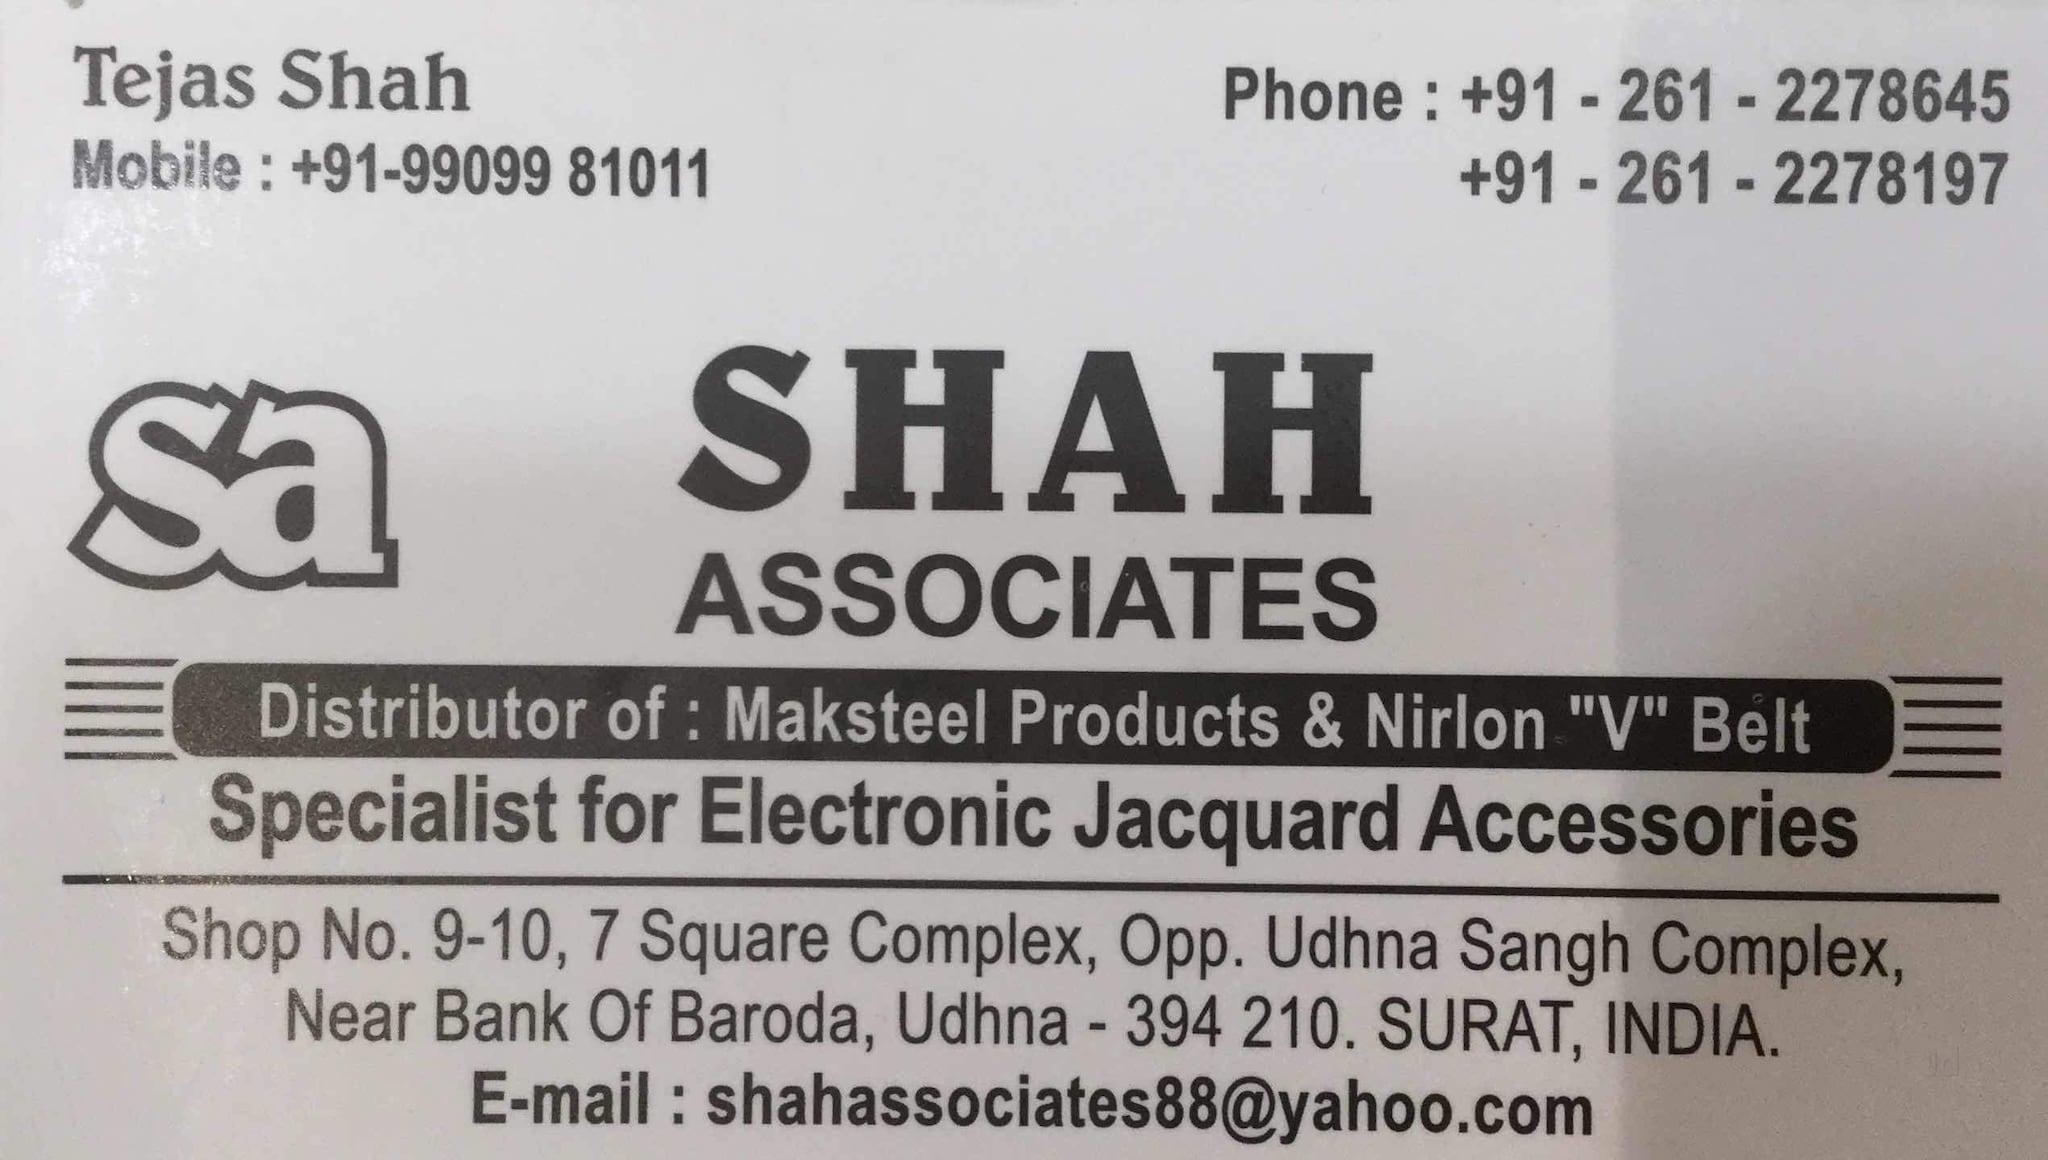 Top Comber Board Distributors in Udhna, Surat - Justdial